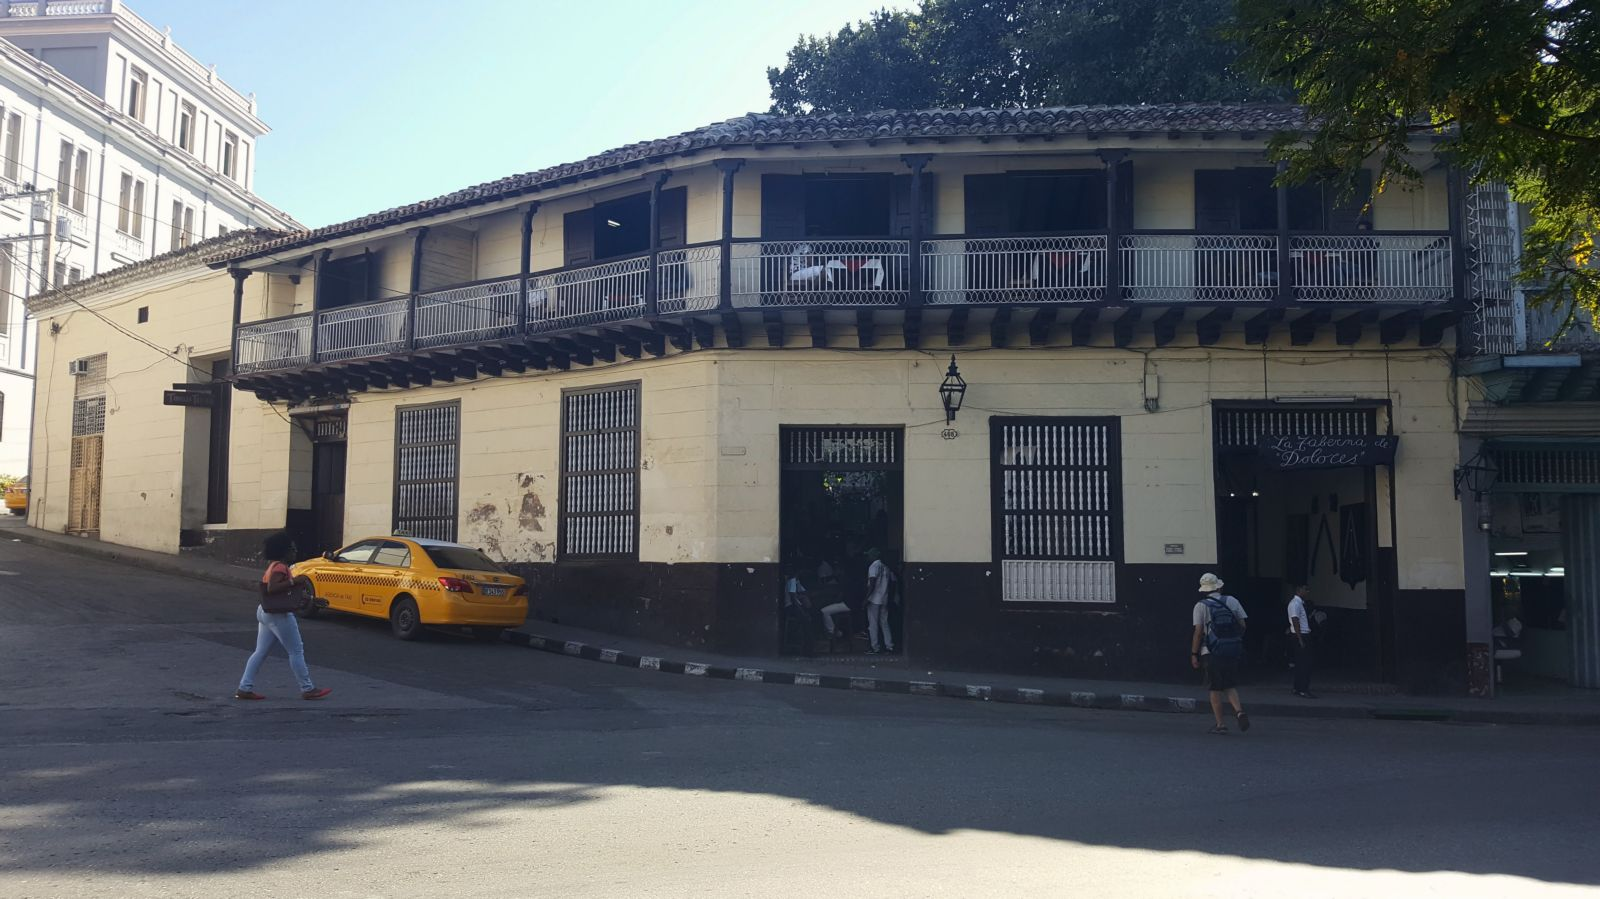 175 Santiago de Cuba